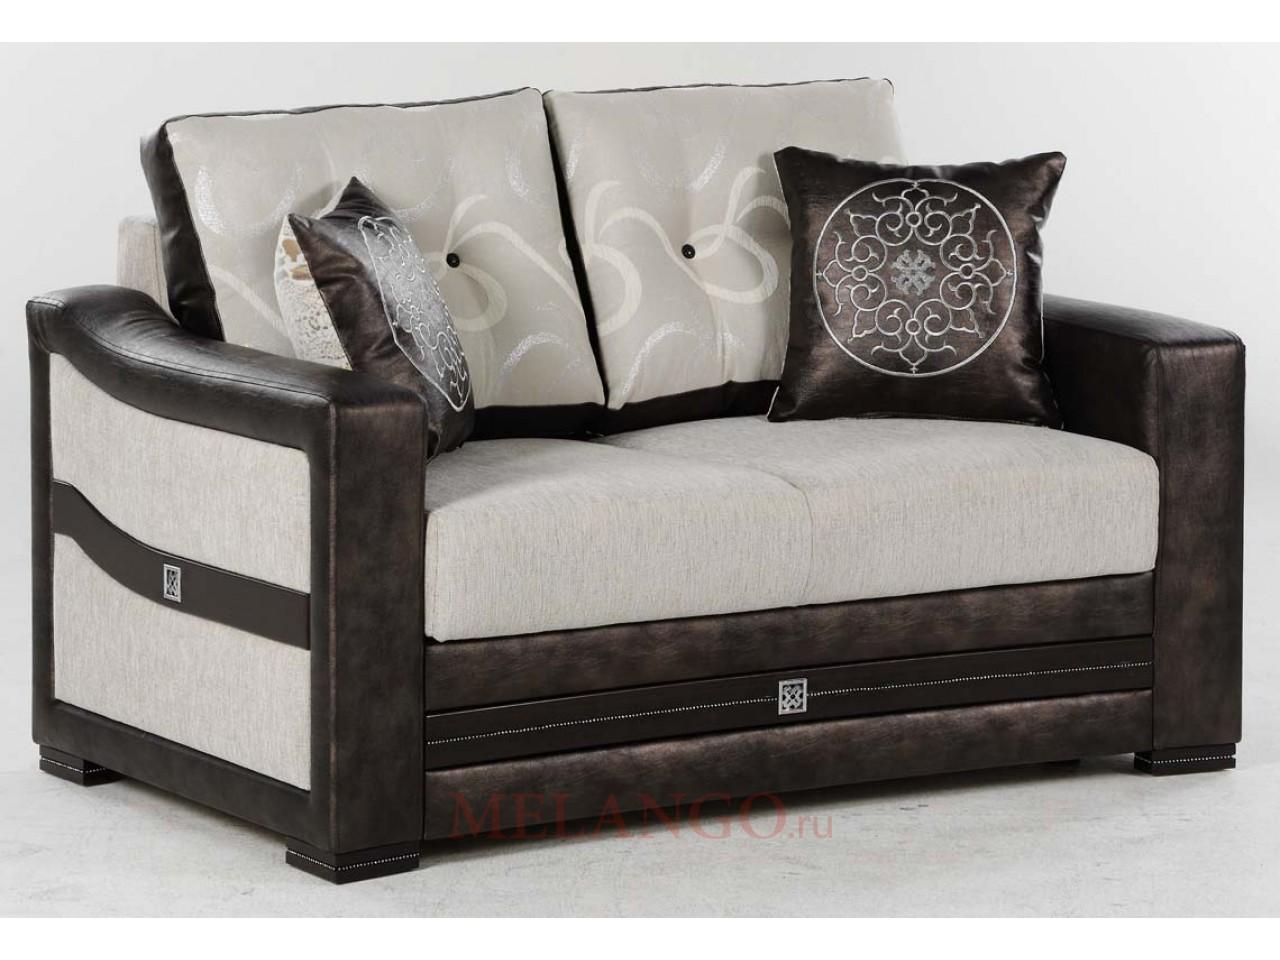 Двухместный диван Каризма (KRZM-02)